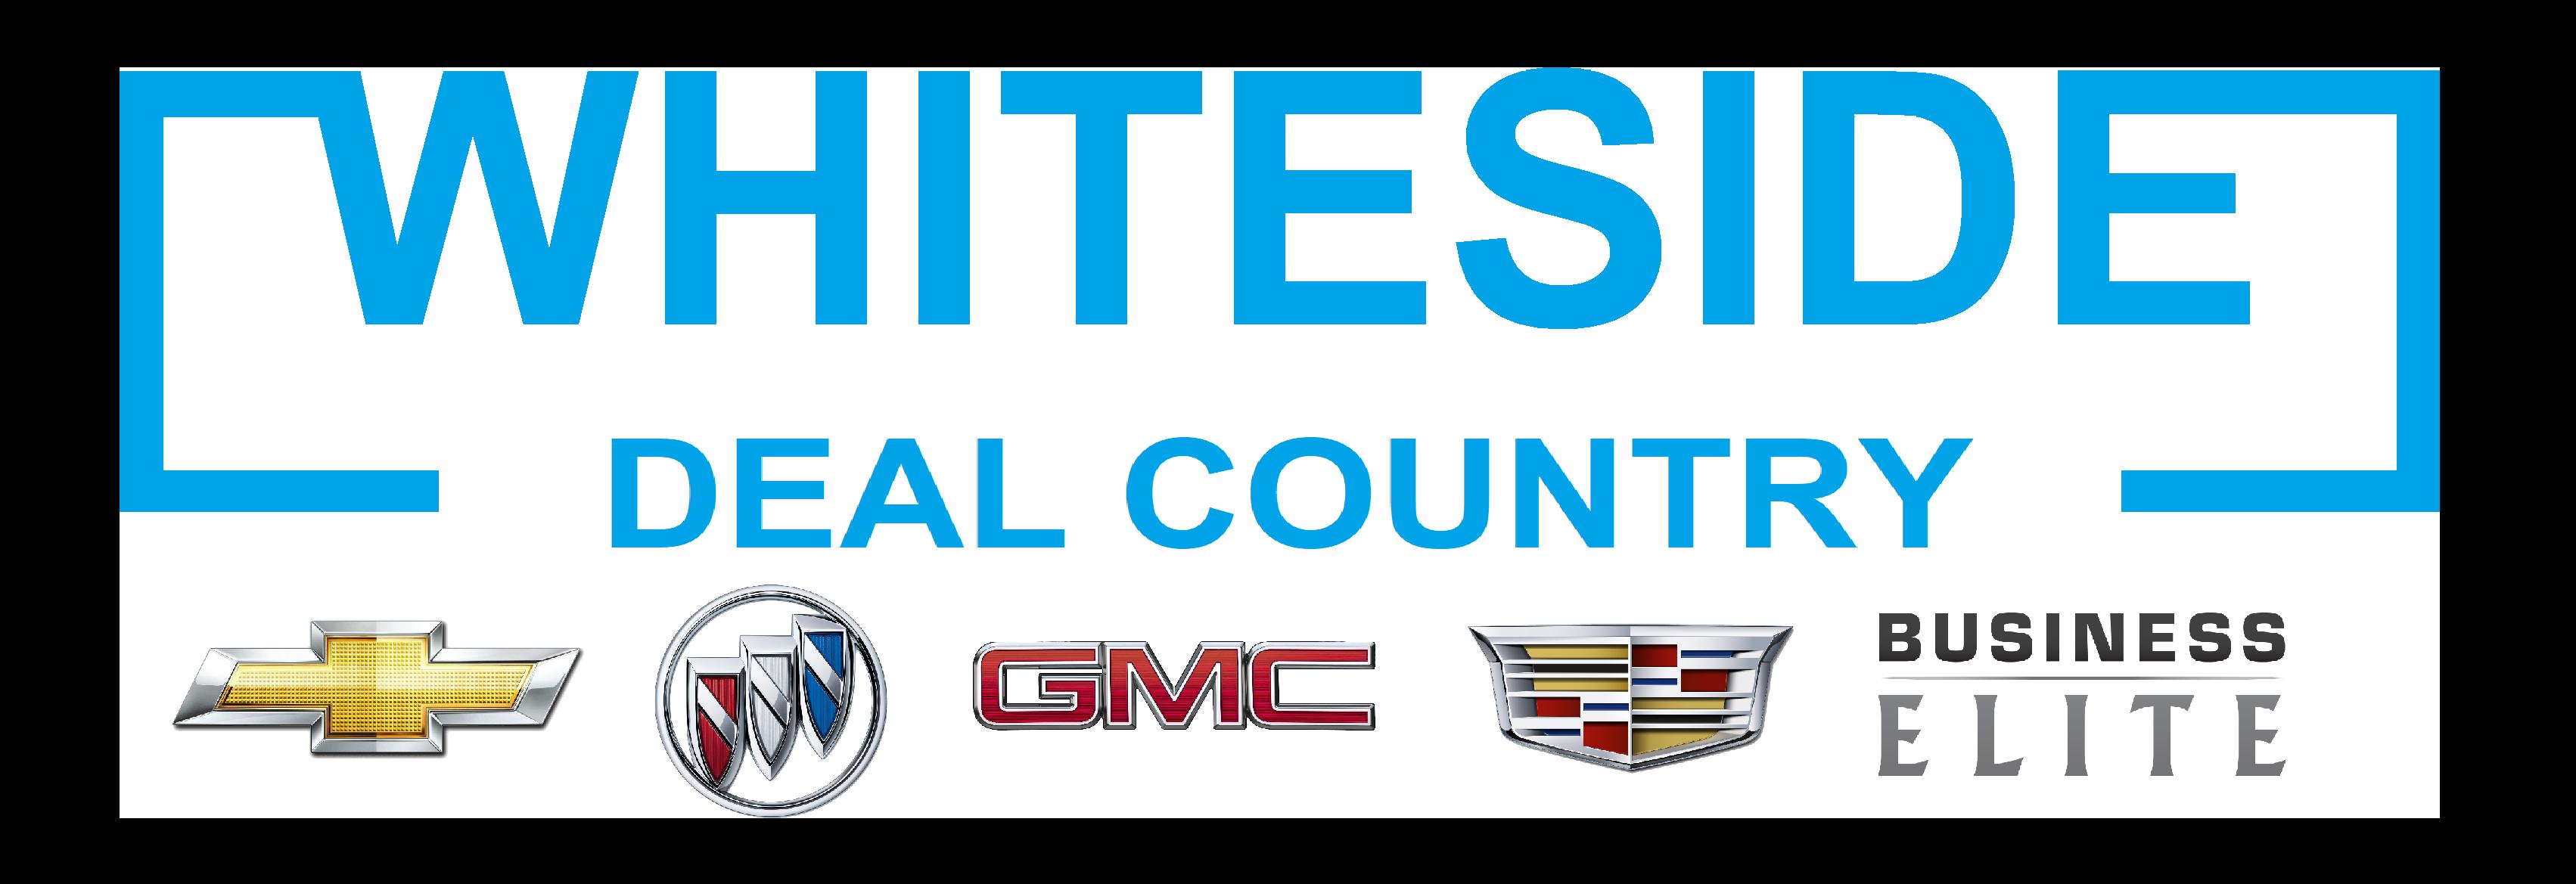 Whiteside of St. Clairsville, Inc logo